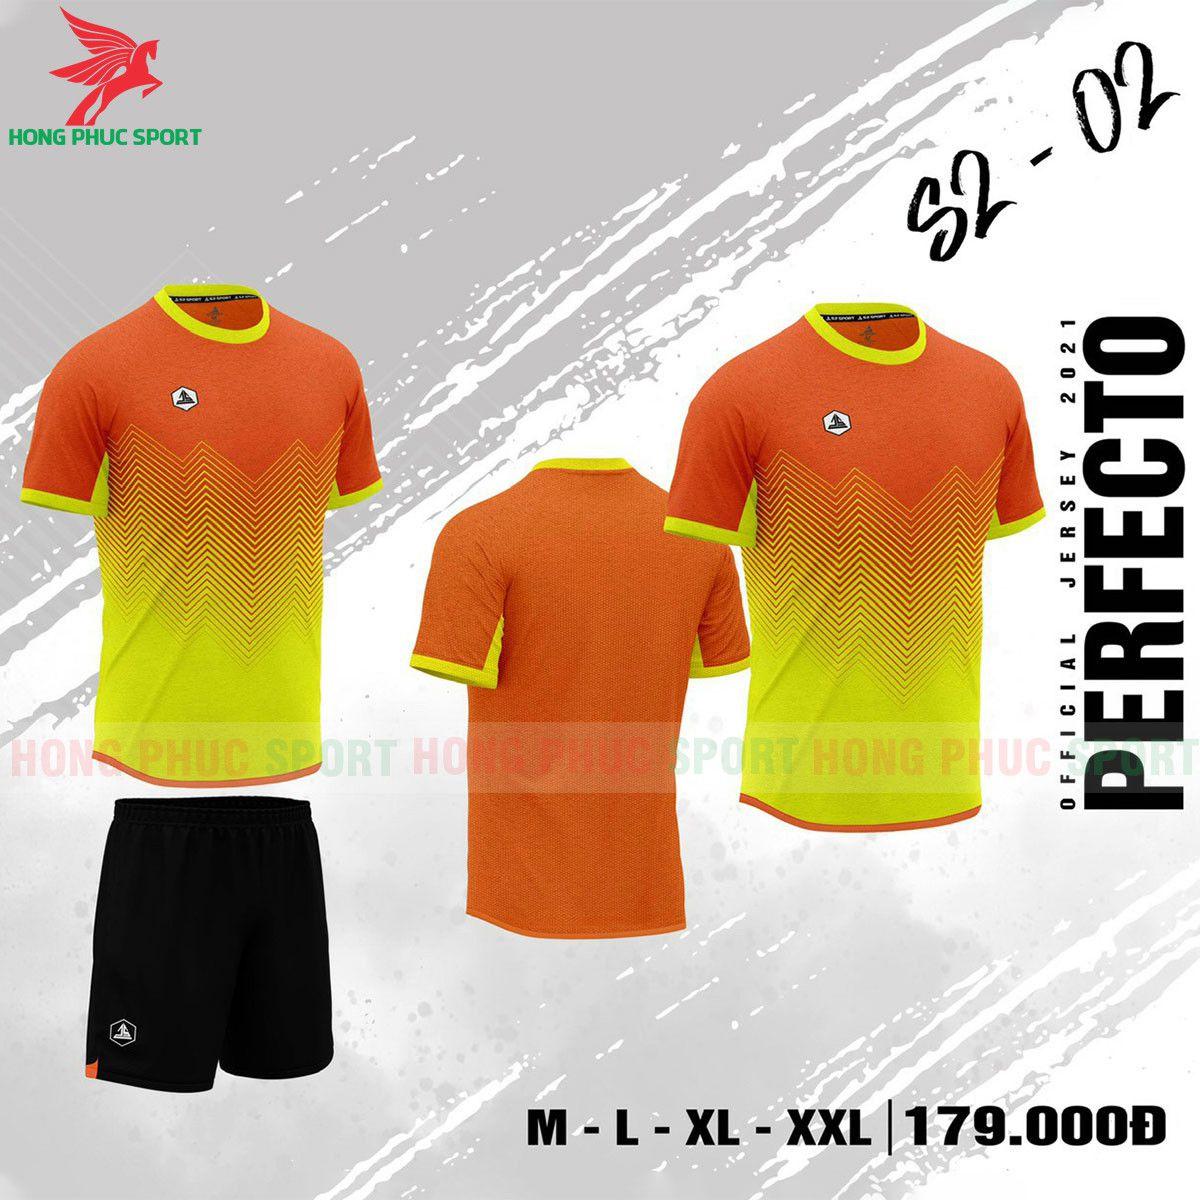 https://cdn.hongphucsport.com/unsafe/s4.shopbay.vn/files/285/ao-bong-da-khong-logo-authentic-2021-perfecto-cam-60f53c88f12a2.jpg